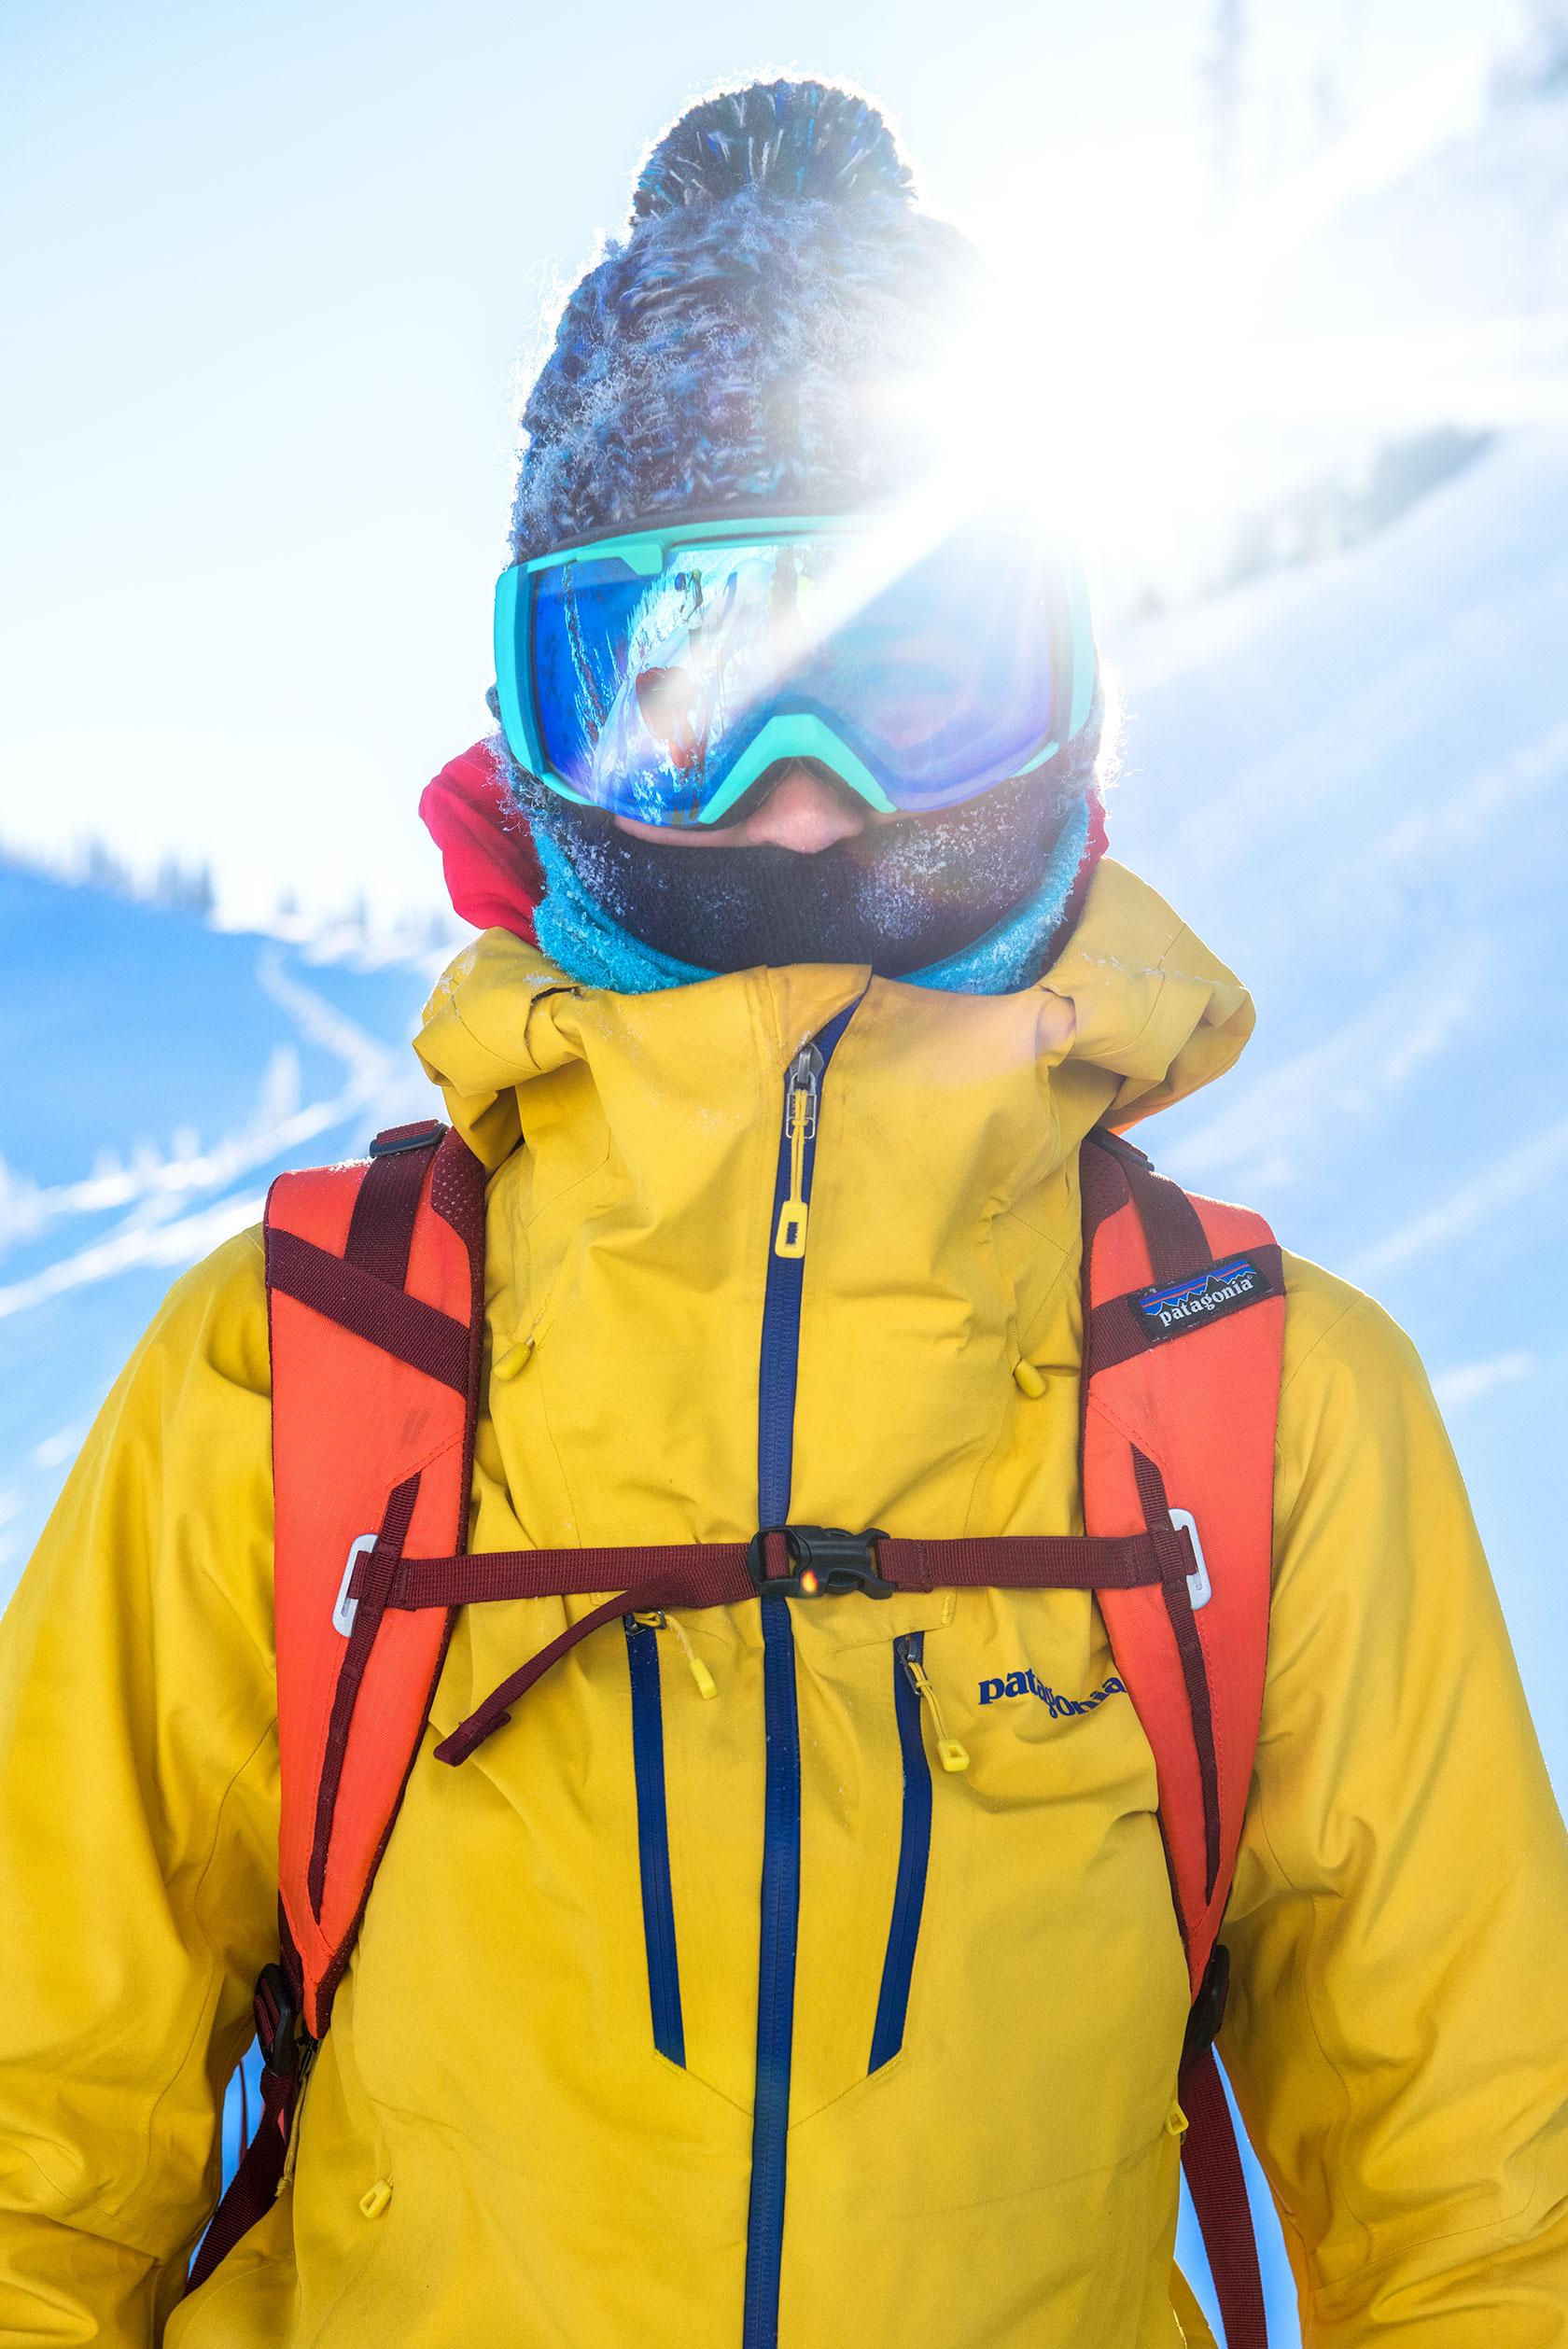 austin-trigg-patagonia-banff-alberta-winter-rogers-pass-british-columbia-bc-portrait-canada-trip-adventure-outside-snow-splitboarding-lifestyle.jpg